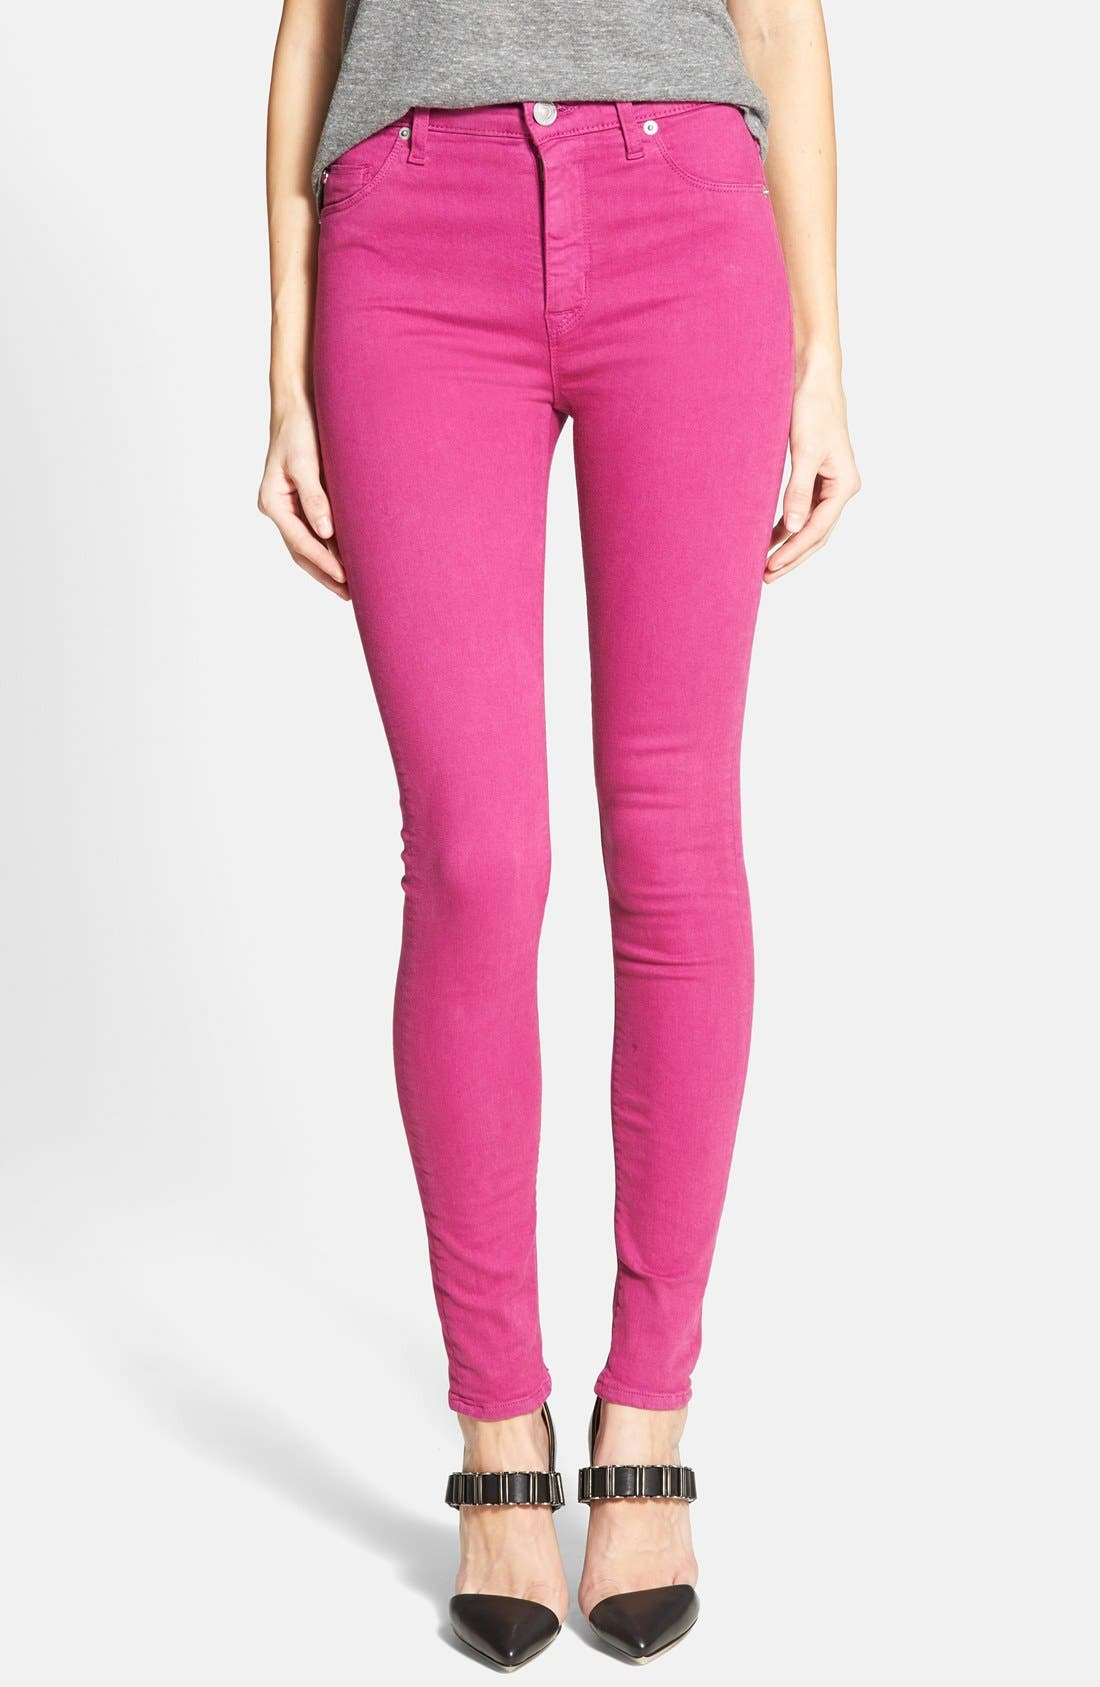 Main Image - Hudson Jeans 'Krista' Super Skinny Jeans (Bright Hydrangea)